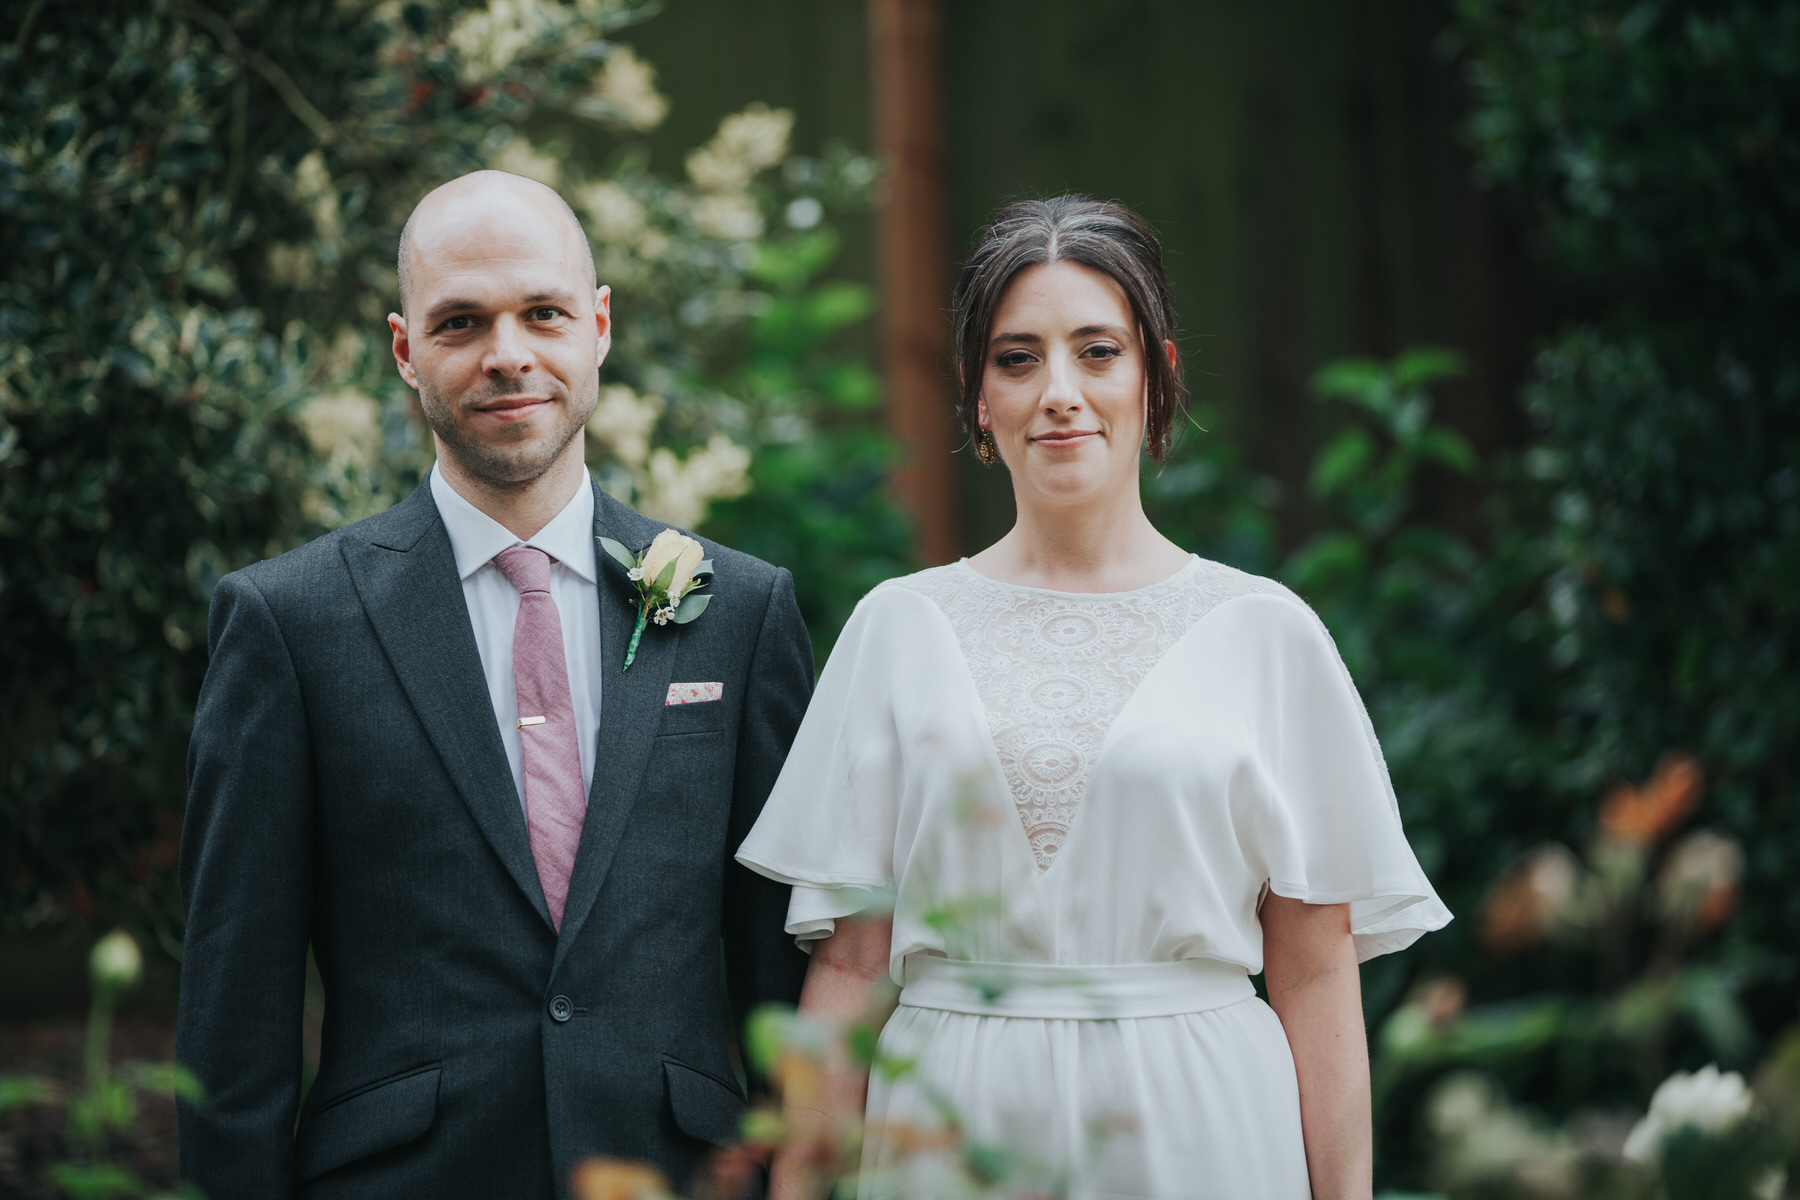 210 Belair Park rose garden alternative bride groom photographs.jpg